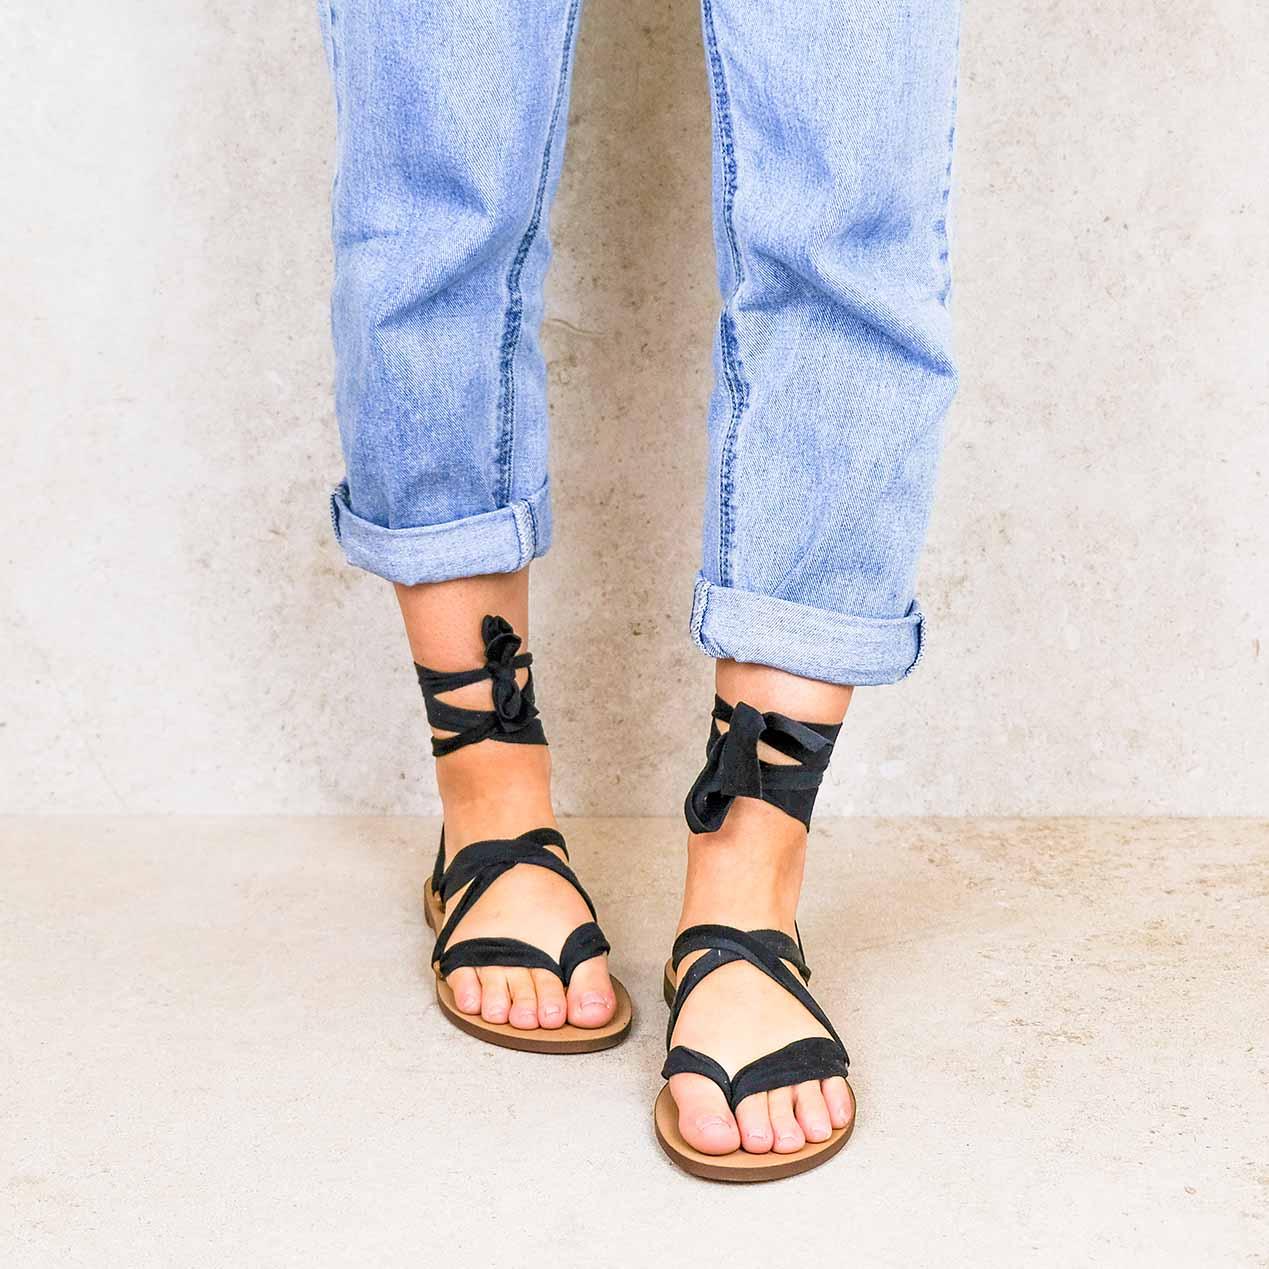 Cancun-vegan-2_lintsandalen sandals travelsandals vegan sustainable sandals wikkelsandalen